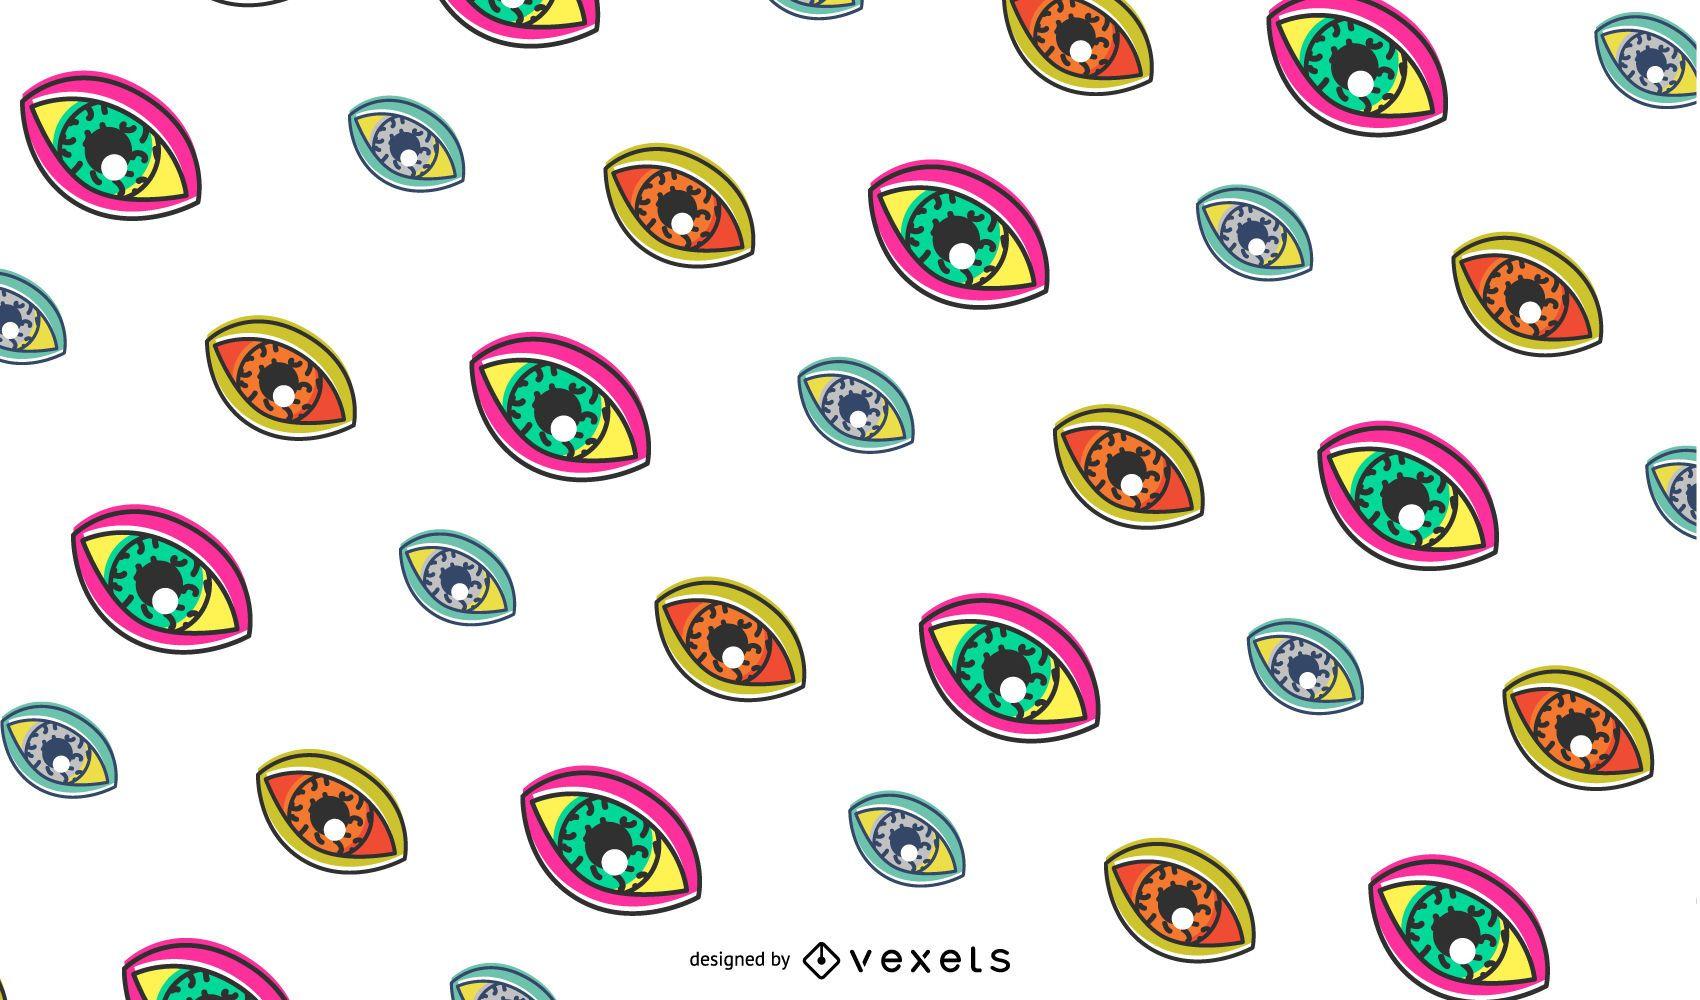 Retro eyes pattern design